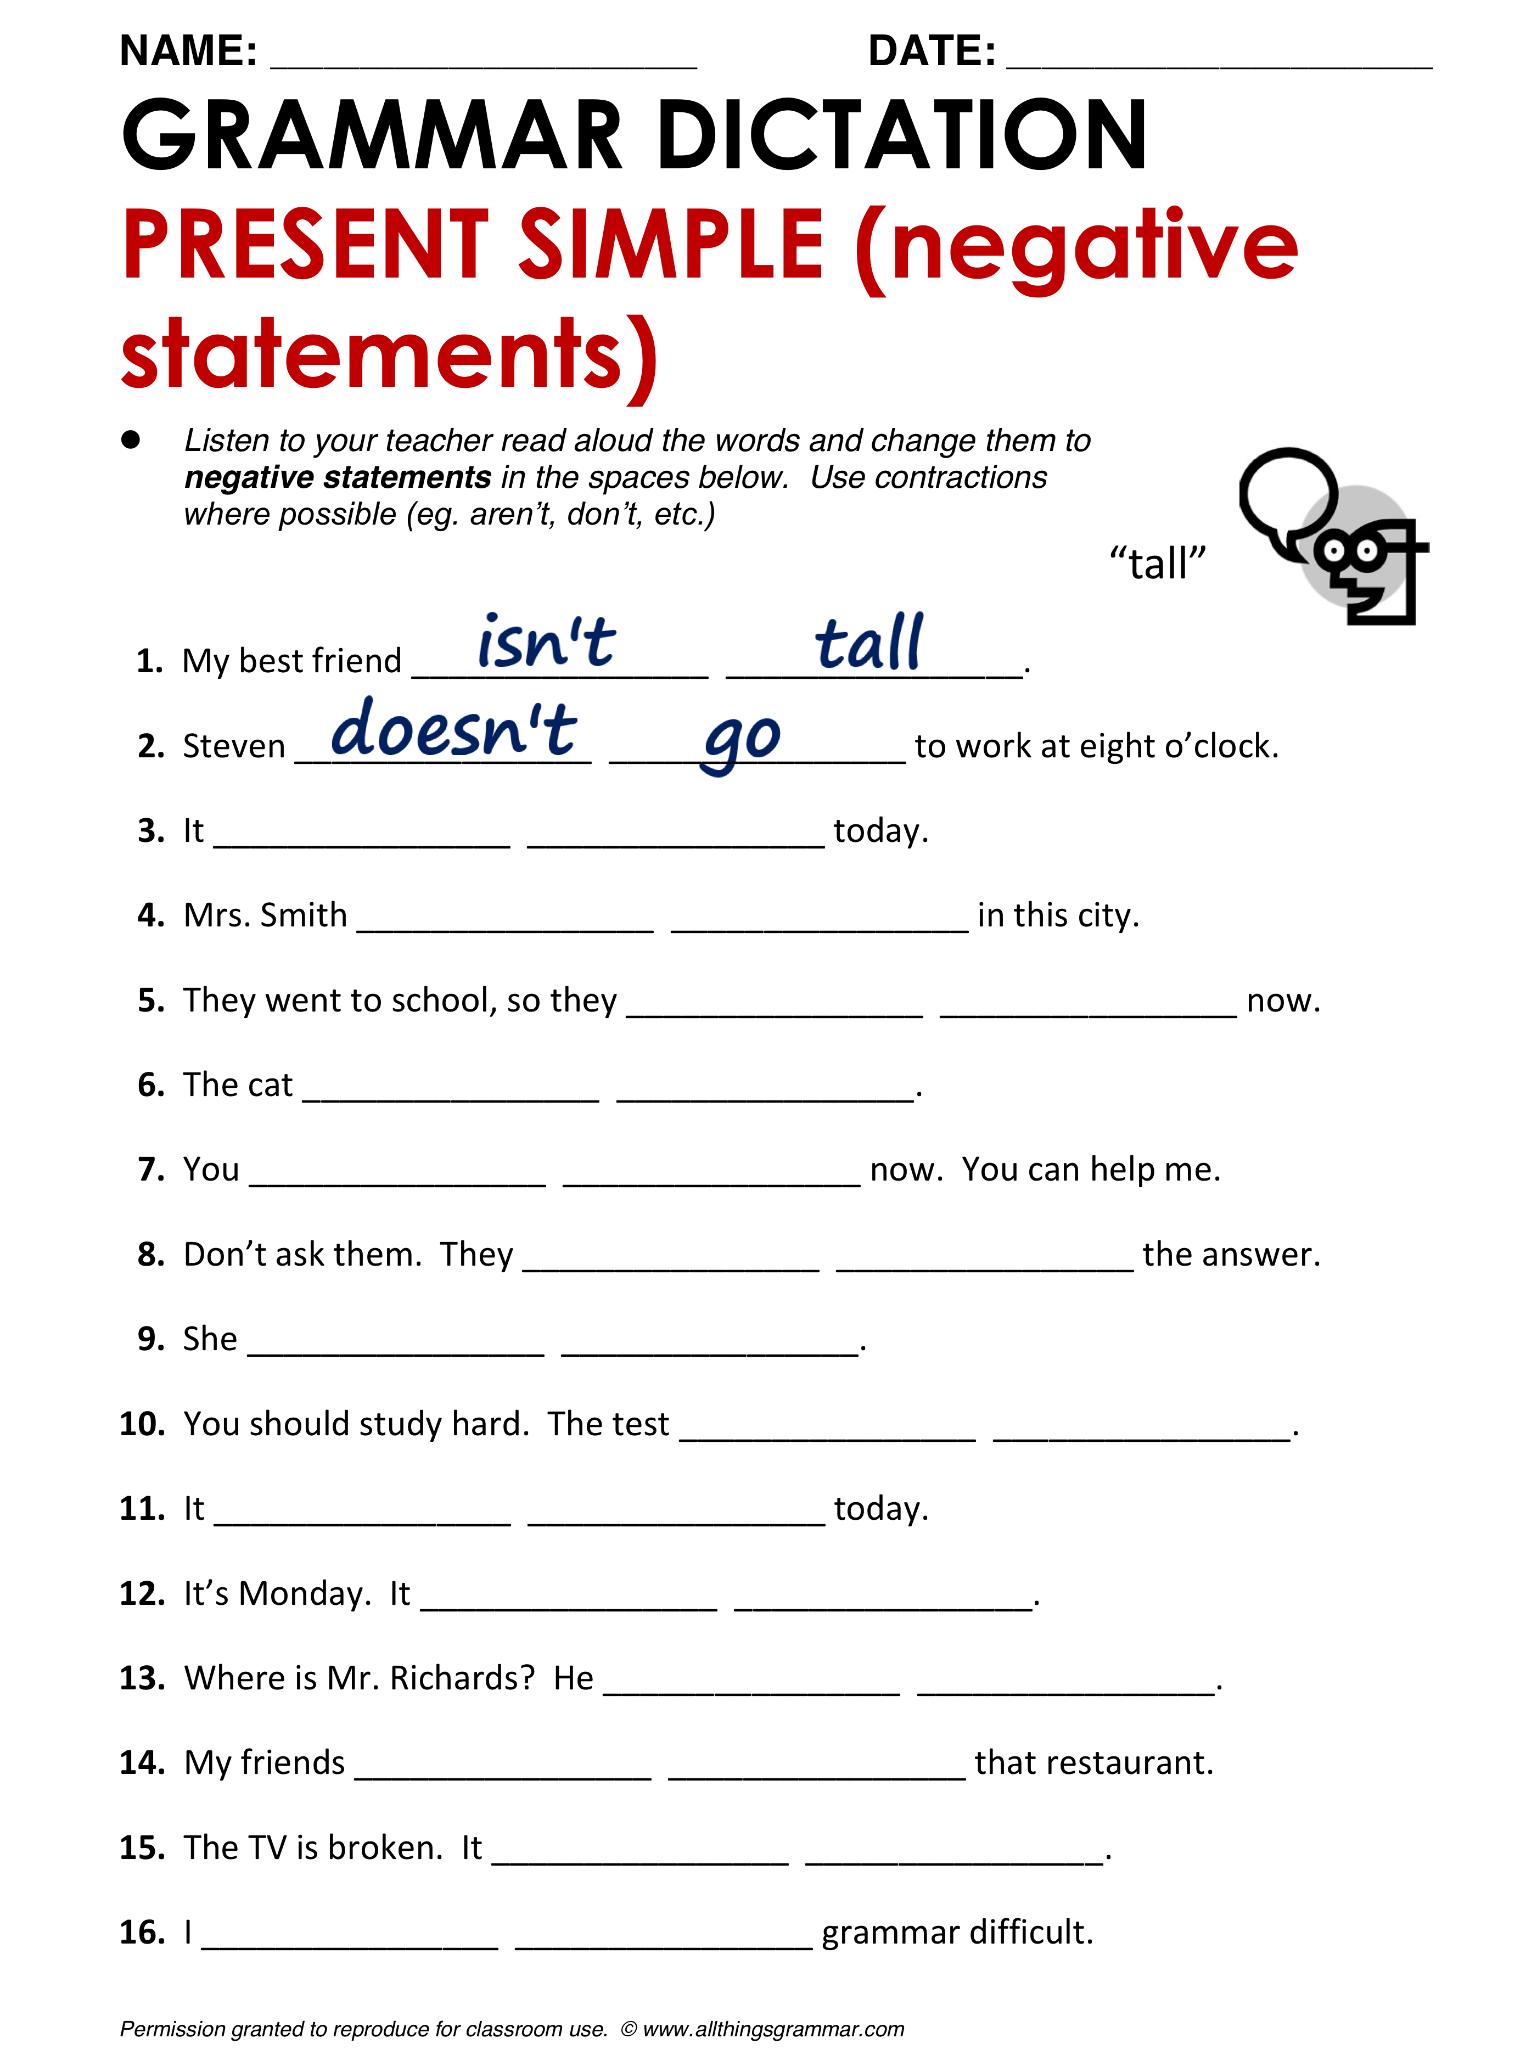 English Grammar Present Simple Negative Statements